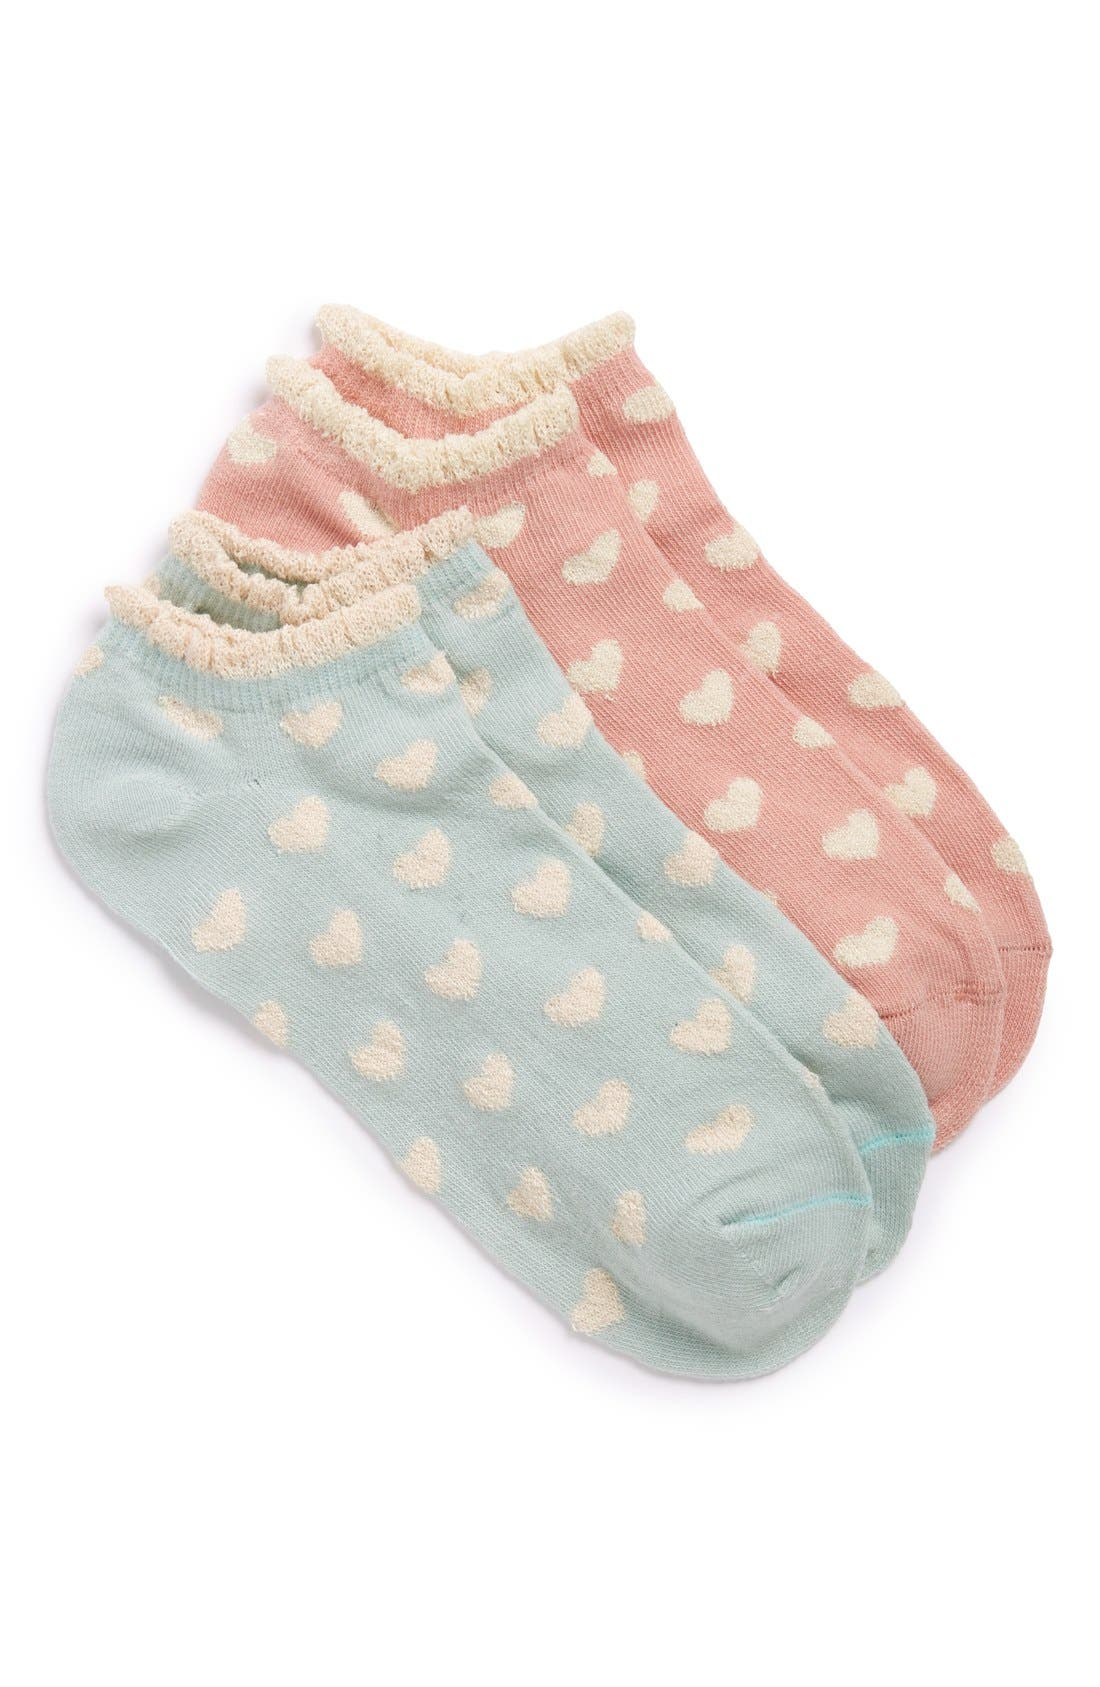 Main Image - Girly Heart Print Ankle Socks (2-Pack)